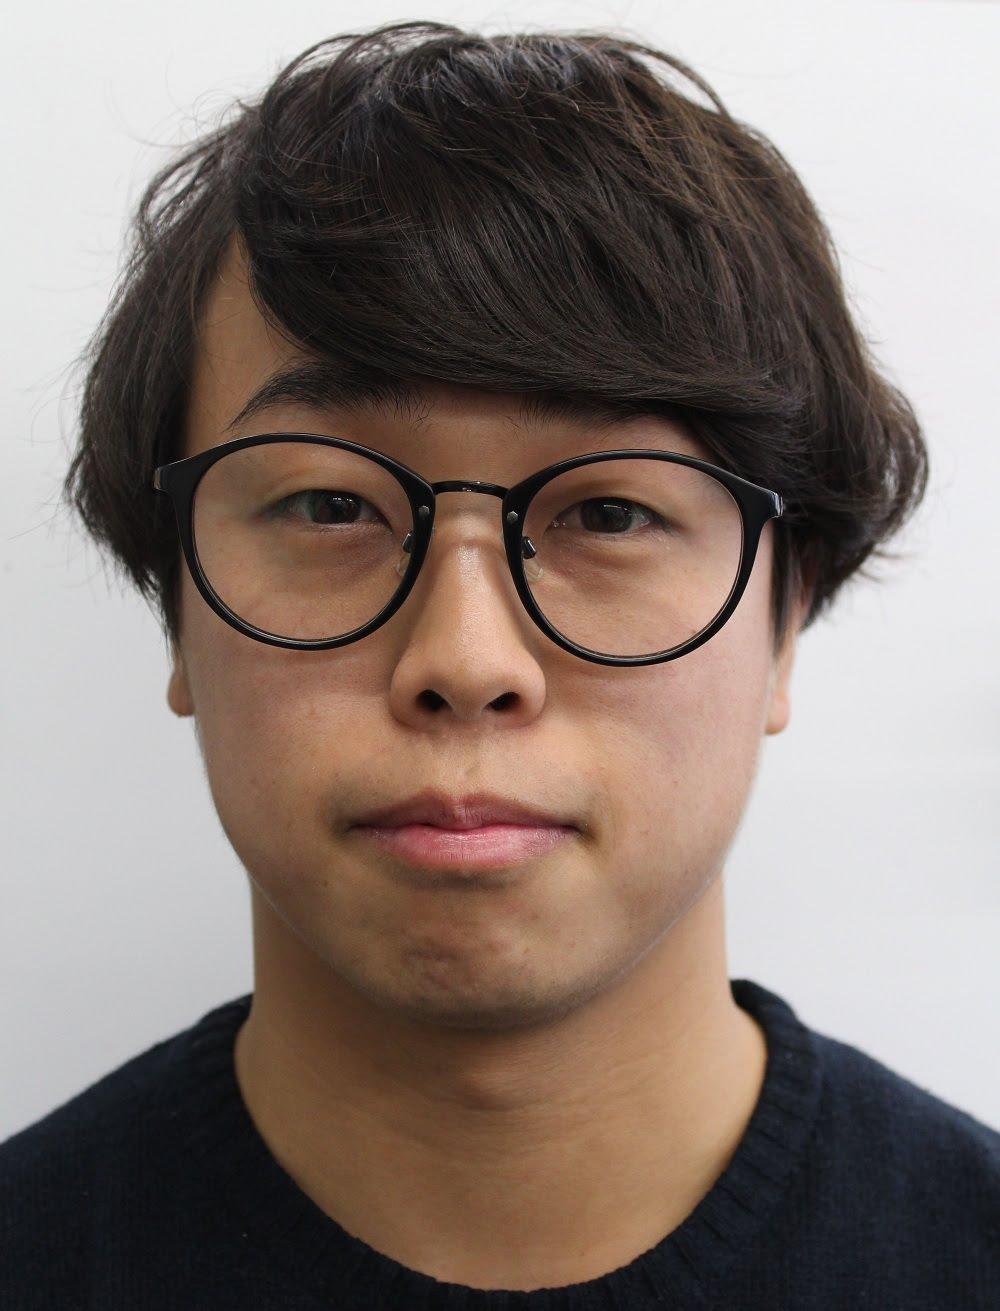 Takuya_new2_small.jpg